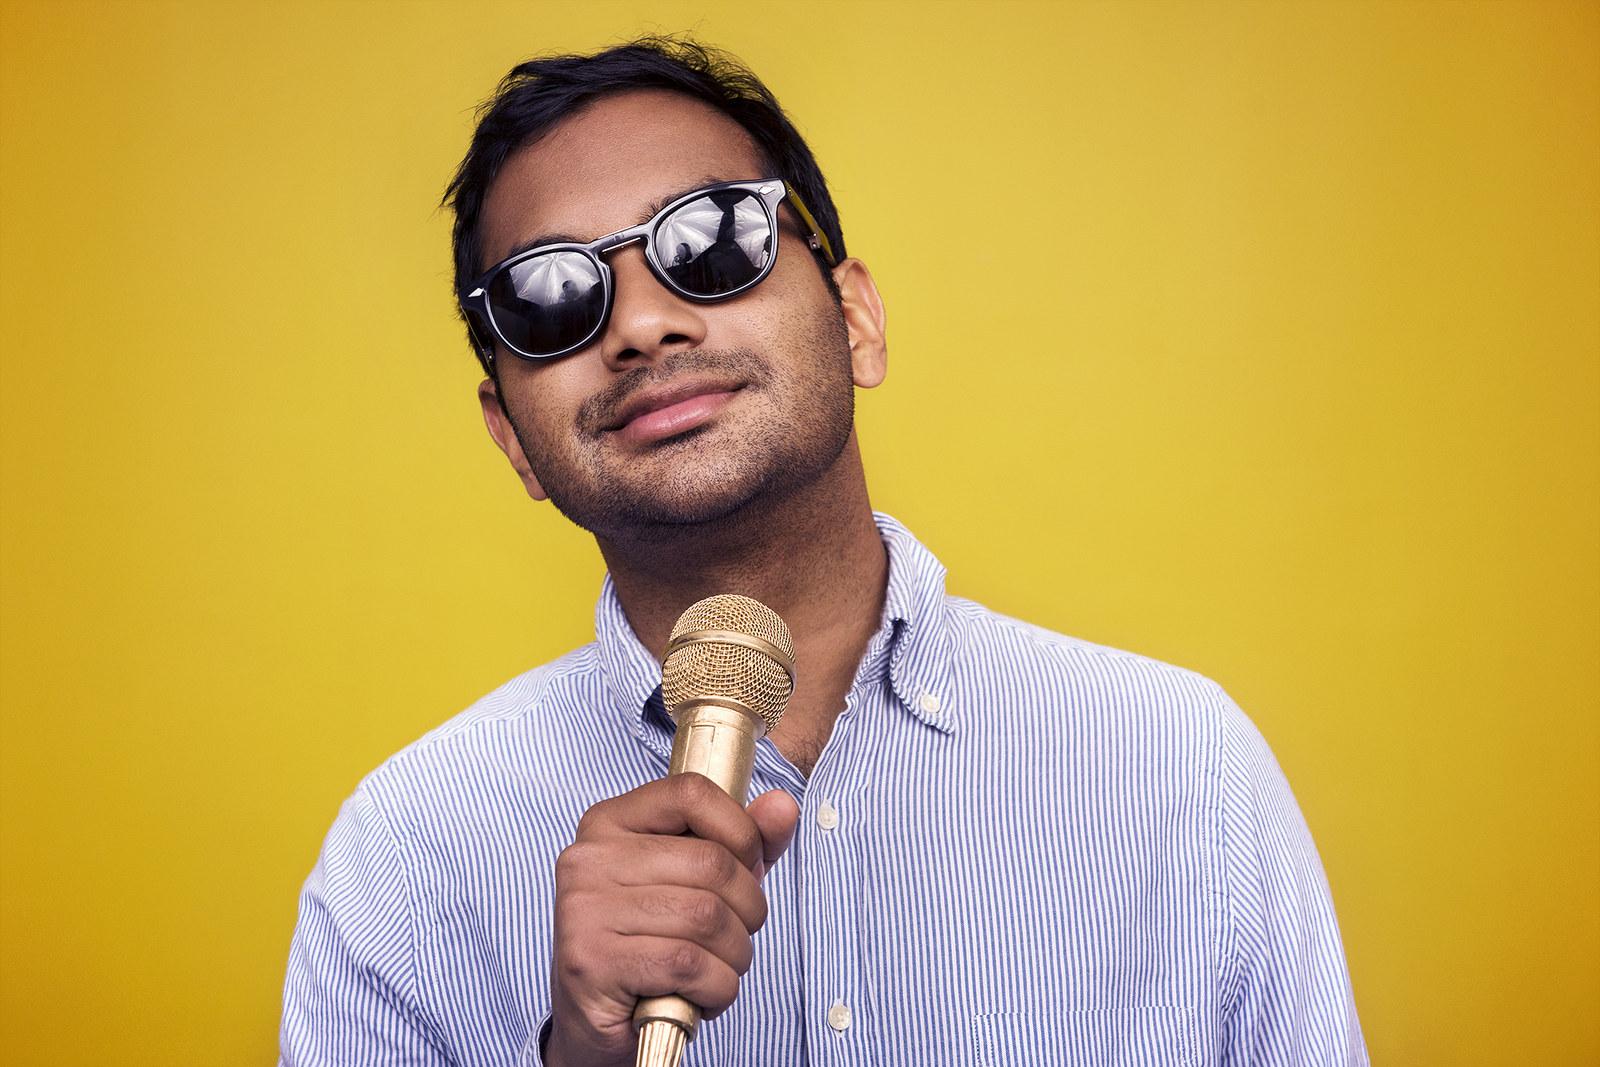 Aziz ansari on dating today sayings